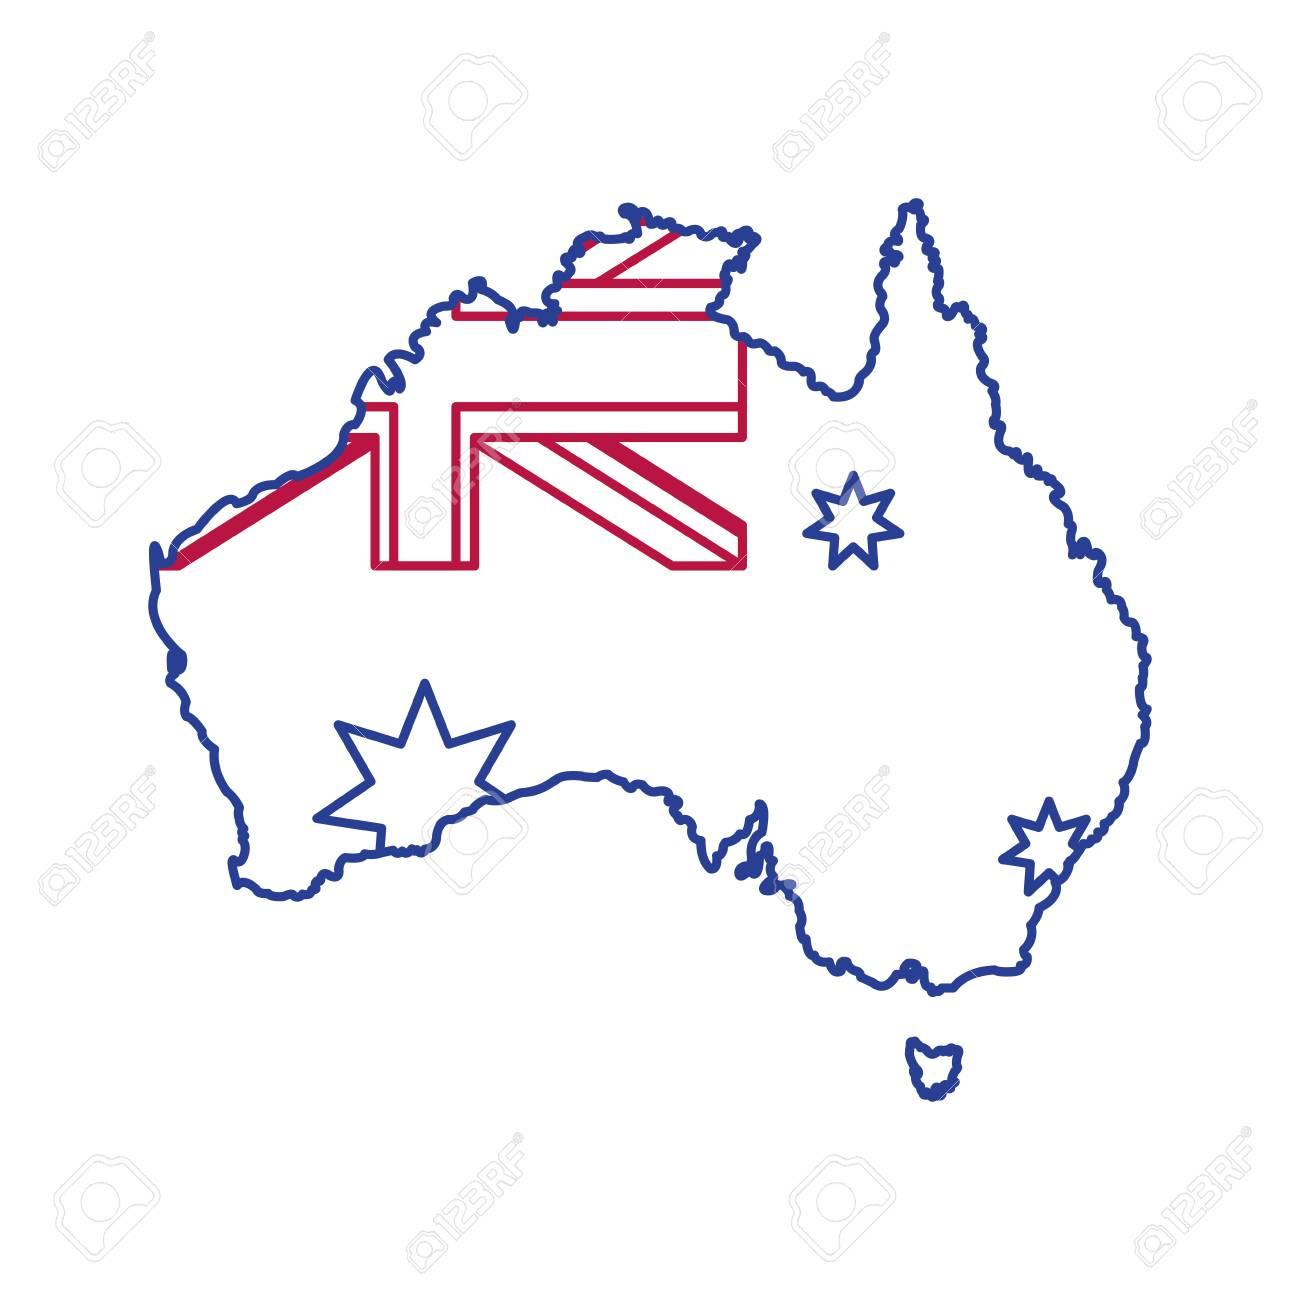 Map Of Australian Landscapes.Australian Map Of Australia Travel Landscape And Landmark Theme